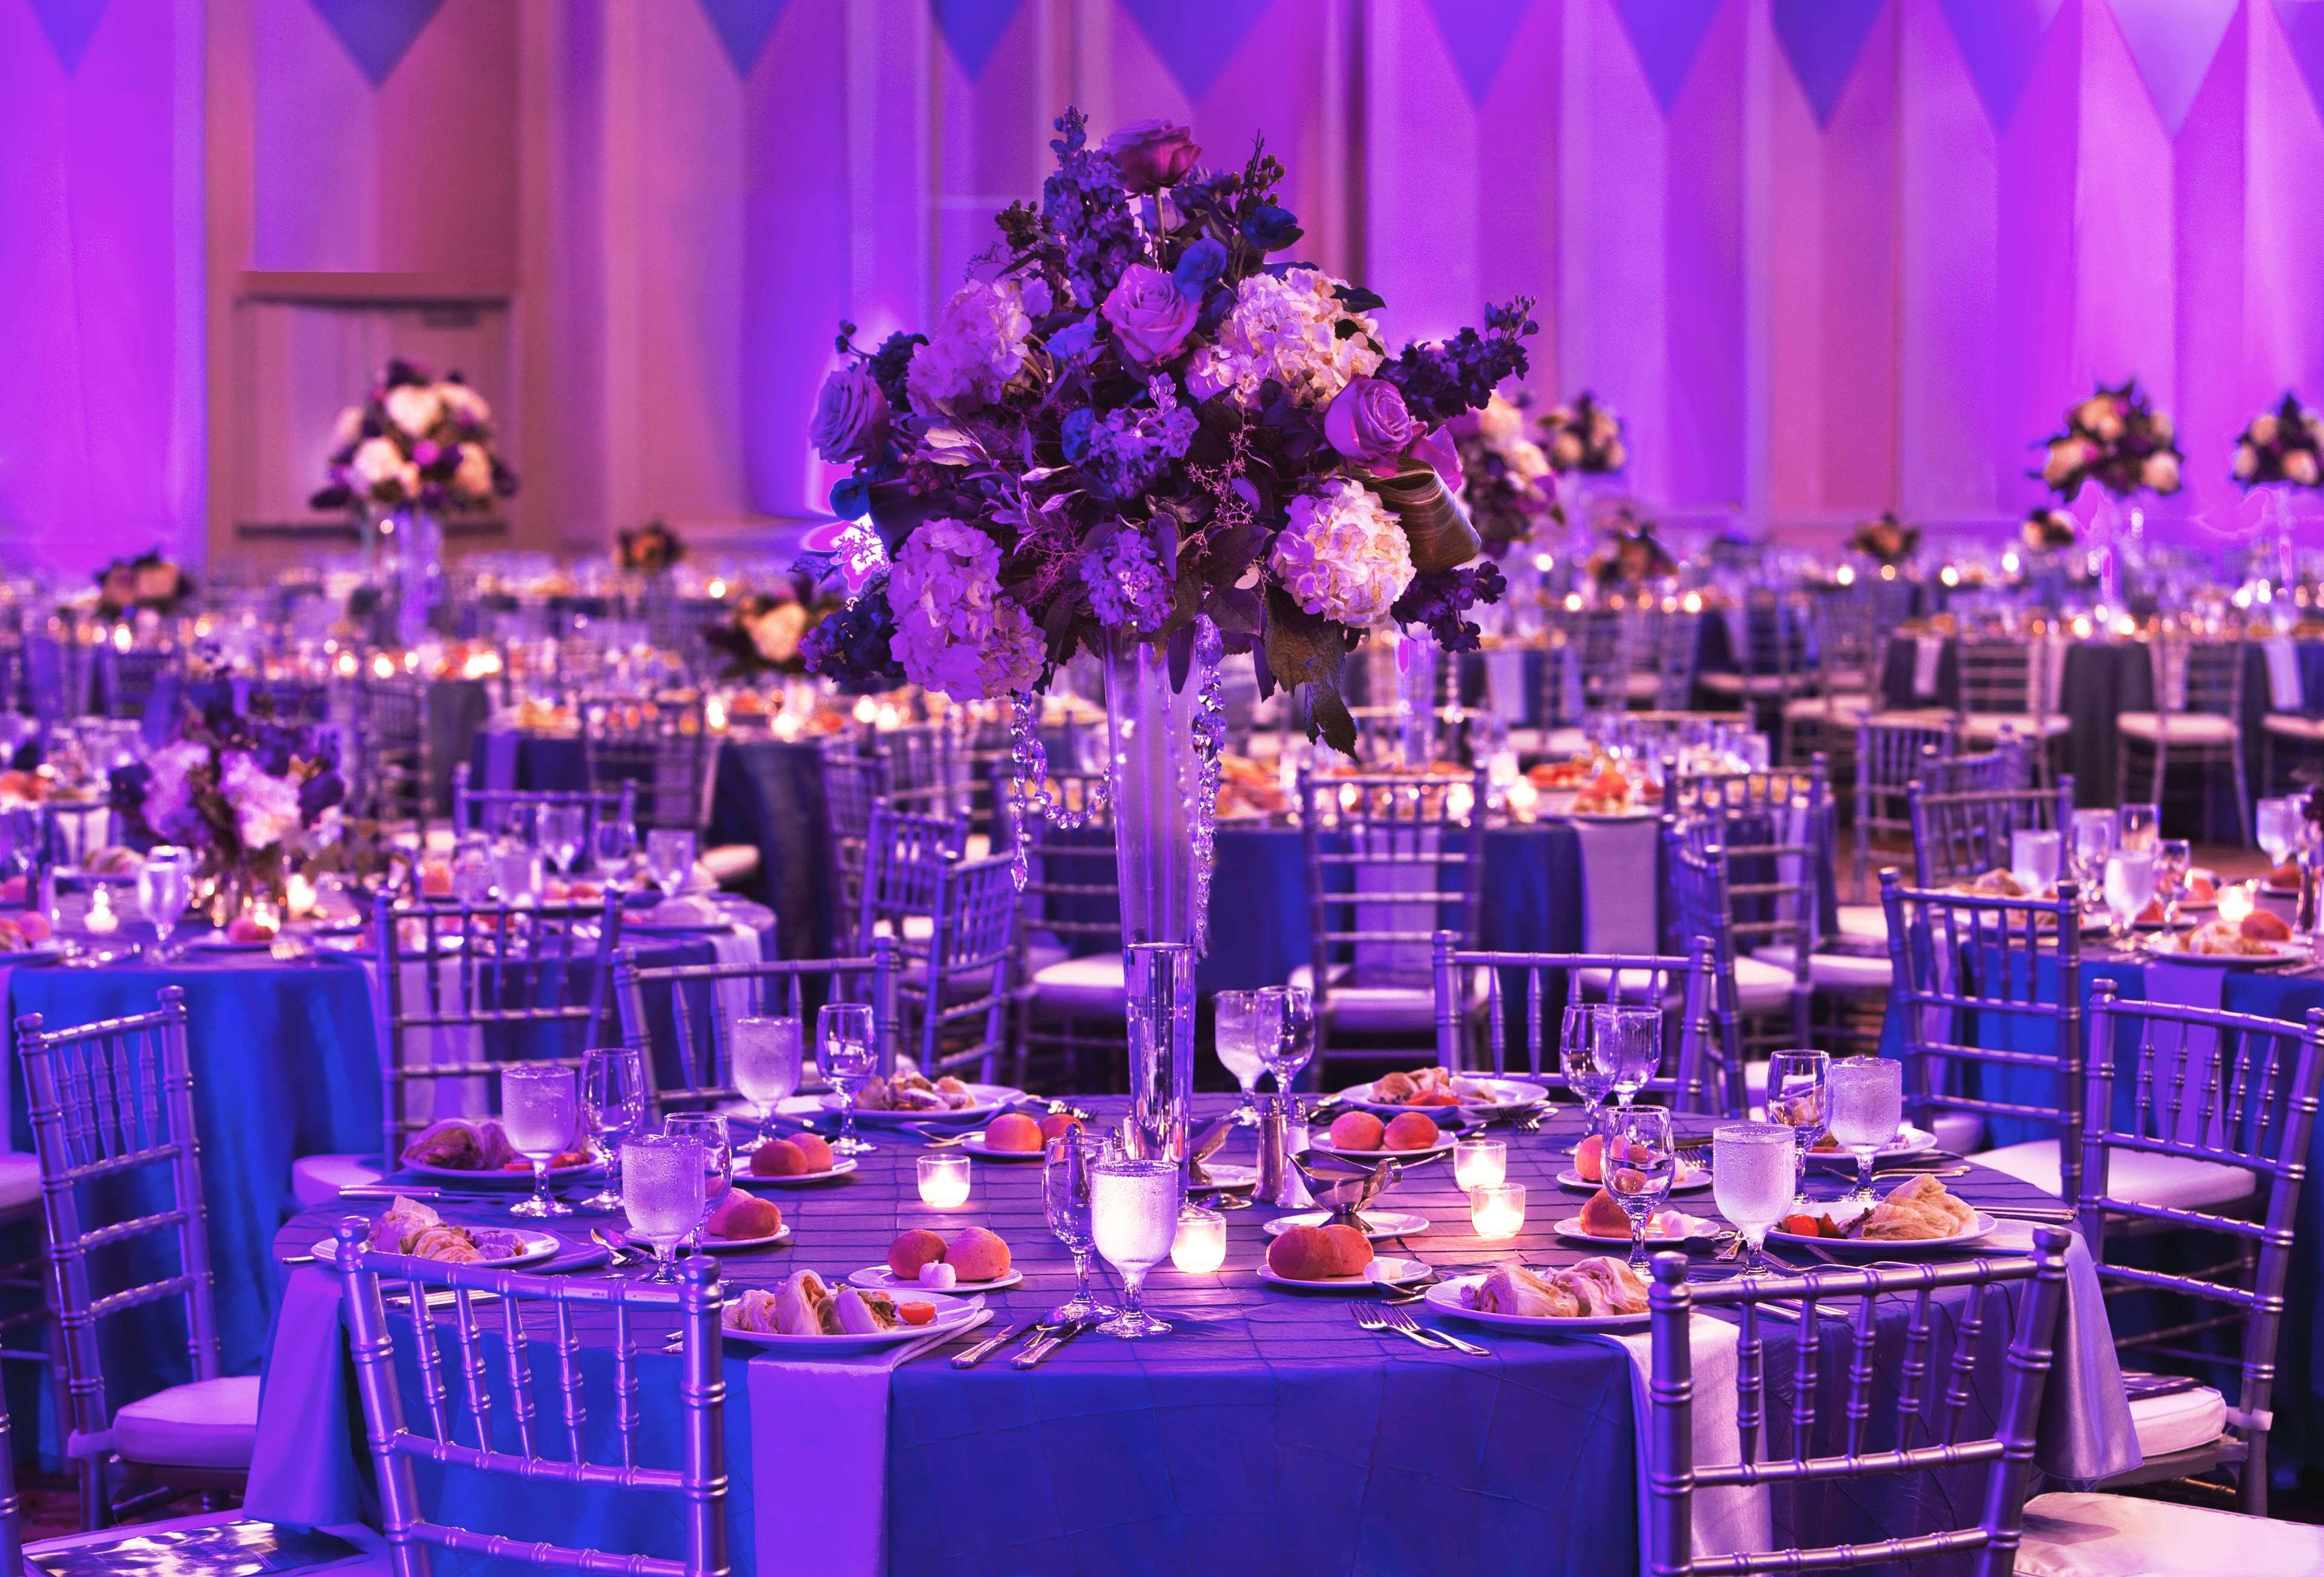 Sheraton Atlantic City Convention Center Hotel image 22